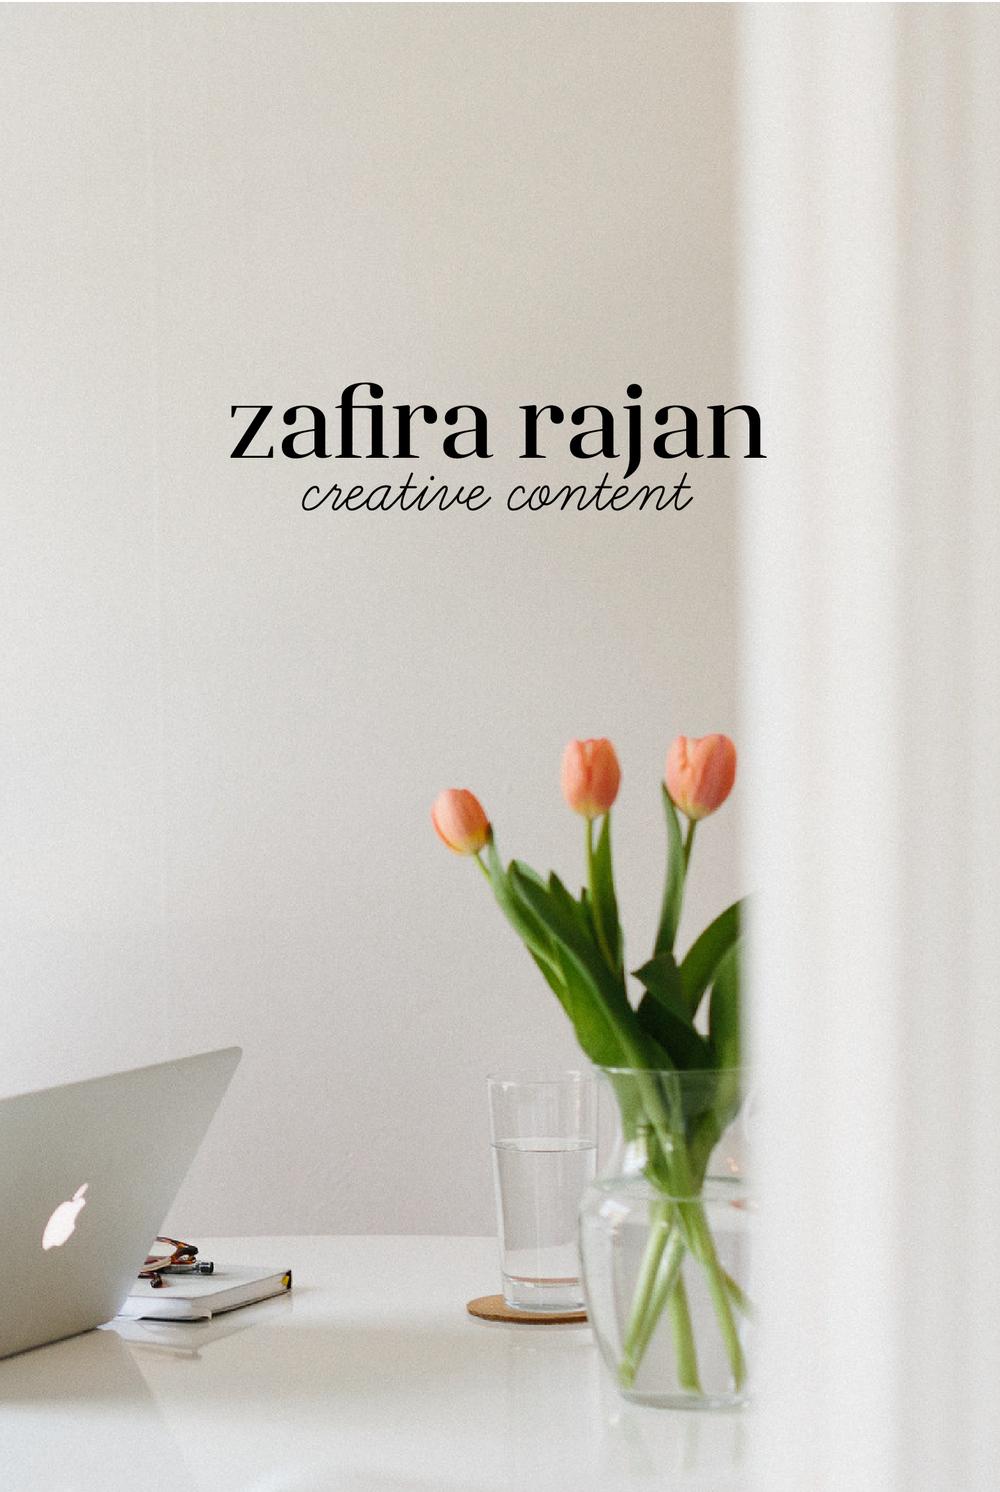 Photo of Zafira Rajan's home by Alexa Mazzarello with logo designed by Salt Design Co.